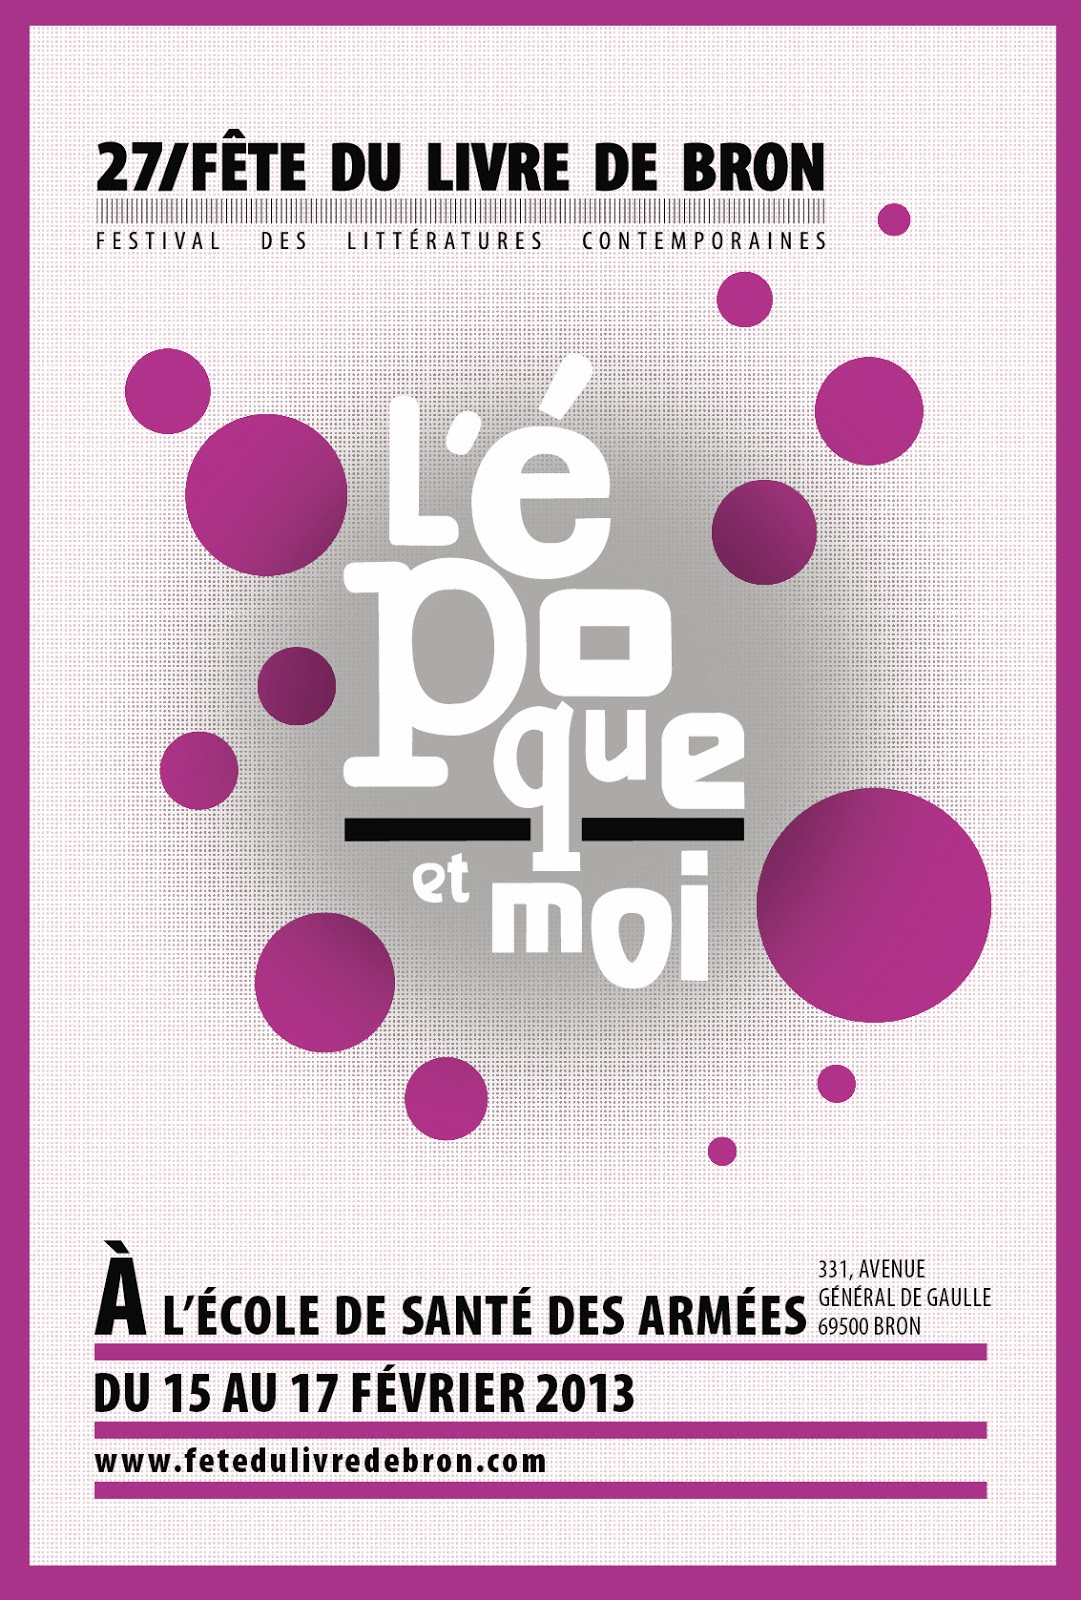 fête+livre+bron+2013